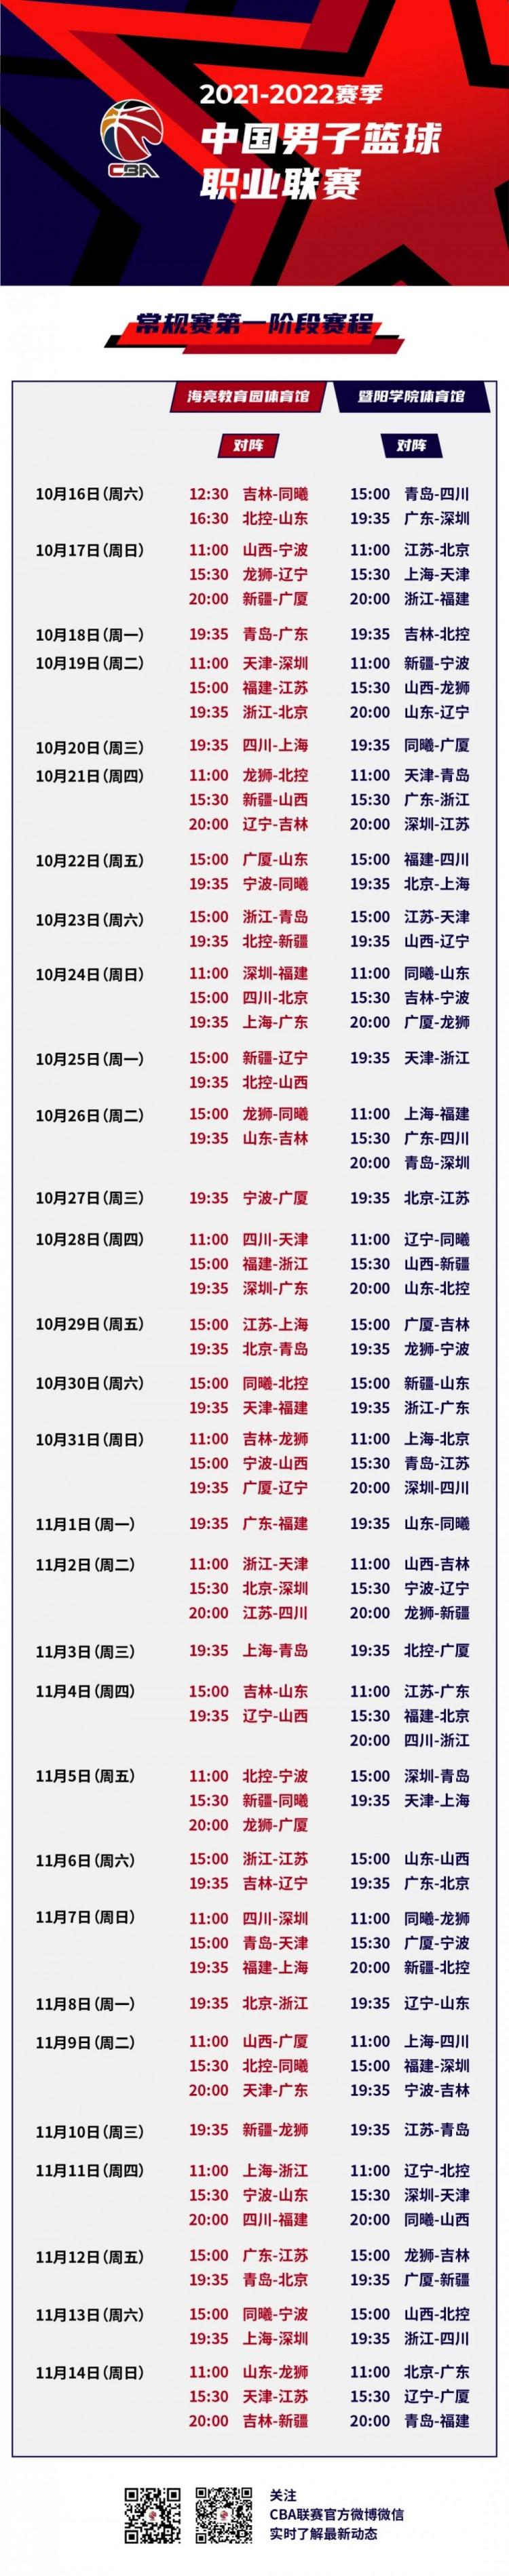 CBA官方公布第一阶段赛程:10月16日揭幕战广东VS深圳